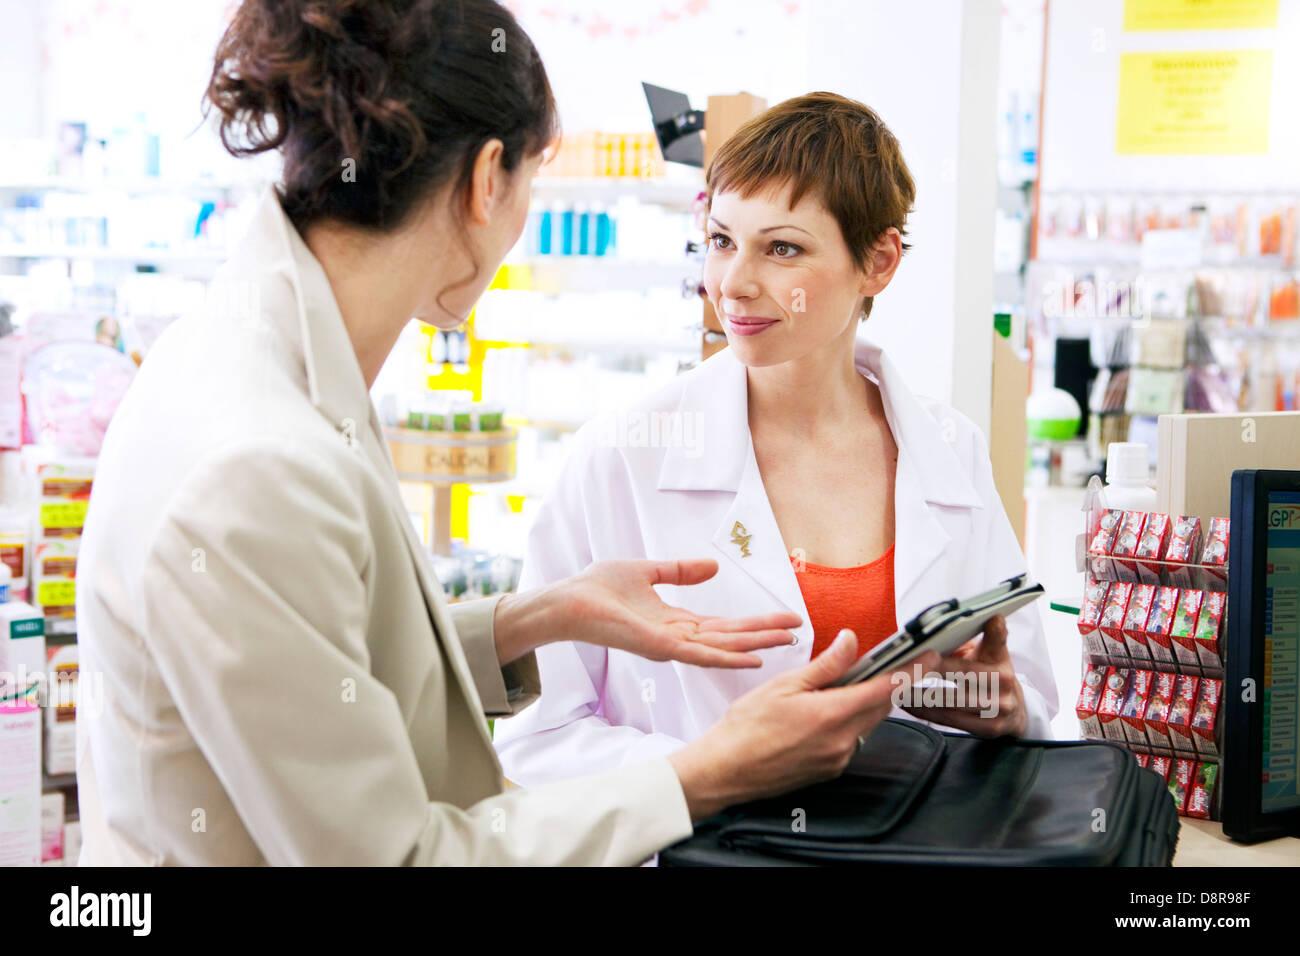 Pharmaceutical Sales Representative Stock Photo 57060543 Alamy